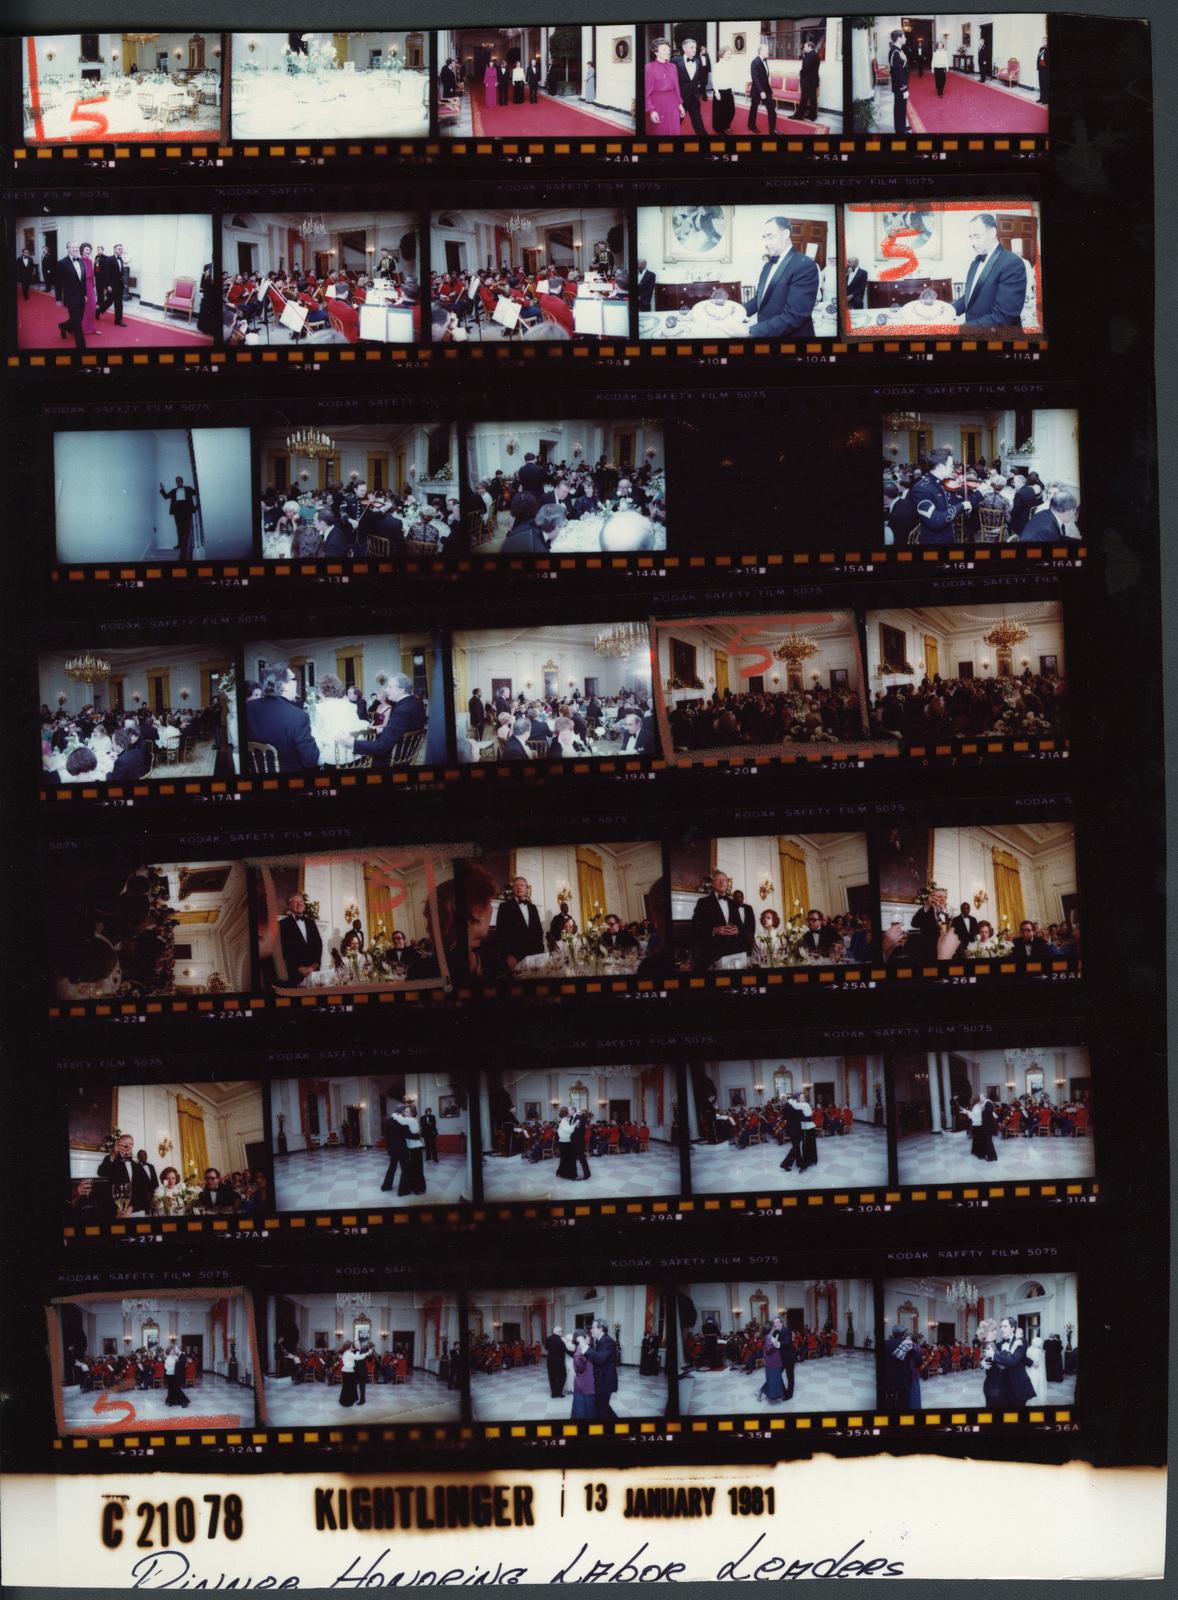 Table settings, Fr. 2-3; Jimmy Carter and Rosalynn Carter - Dinner honoring Labor Leaders, Fr. 4-7; USMC Orchestra, Fr. 8-9; Waiter staff serving, Fr. 10-11; Jimmy Carter and Rosalynn Carter - Dinner honoring Labor Leaders, Fr. 13-27; Jimmy Carter and Rosalynn Carter - Leading dancing after dinner, Fr. 28-36